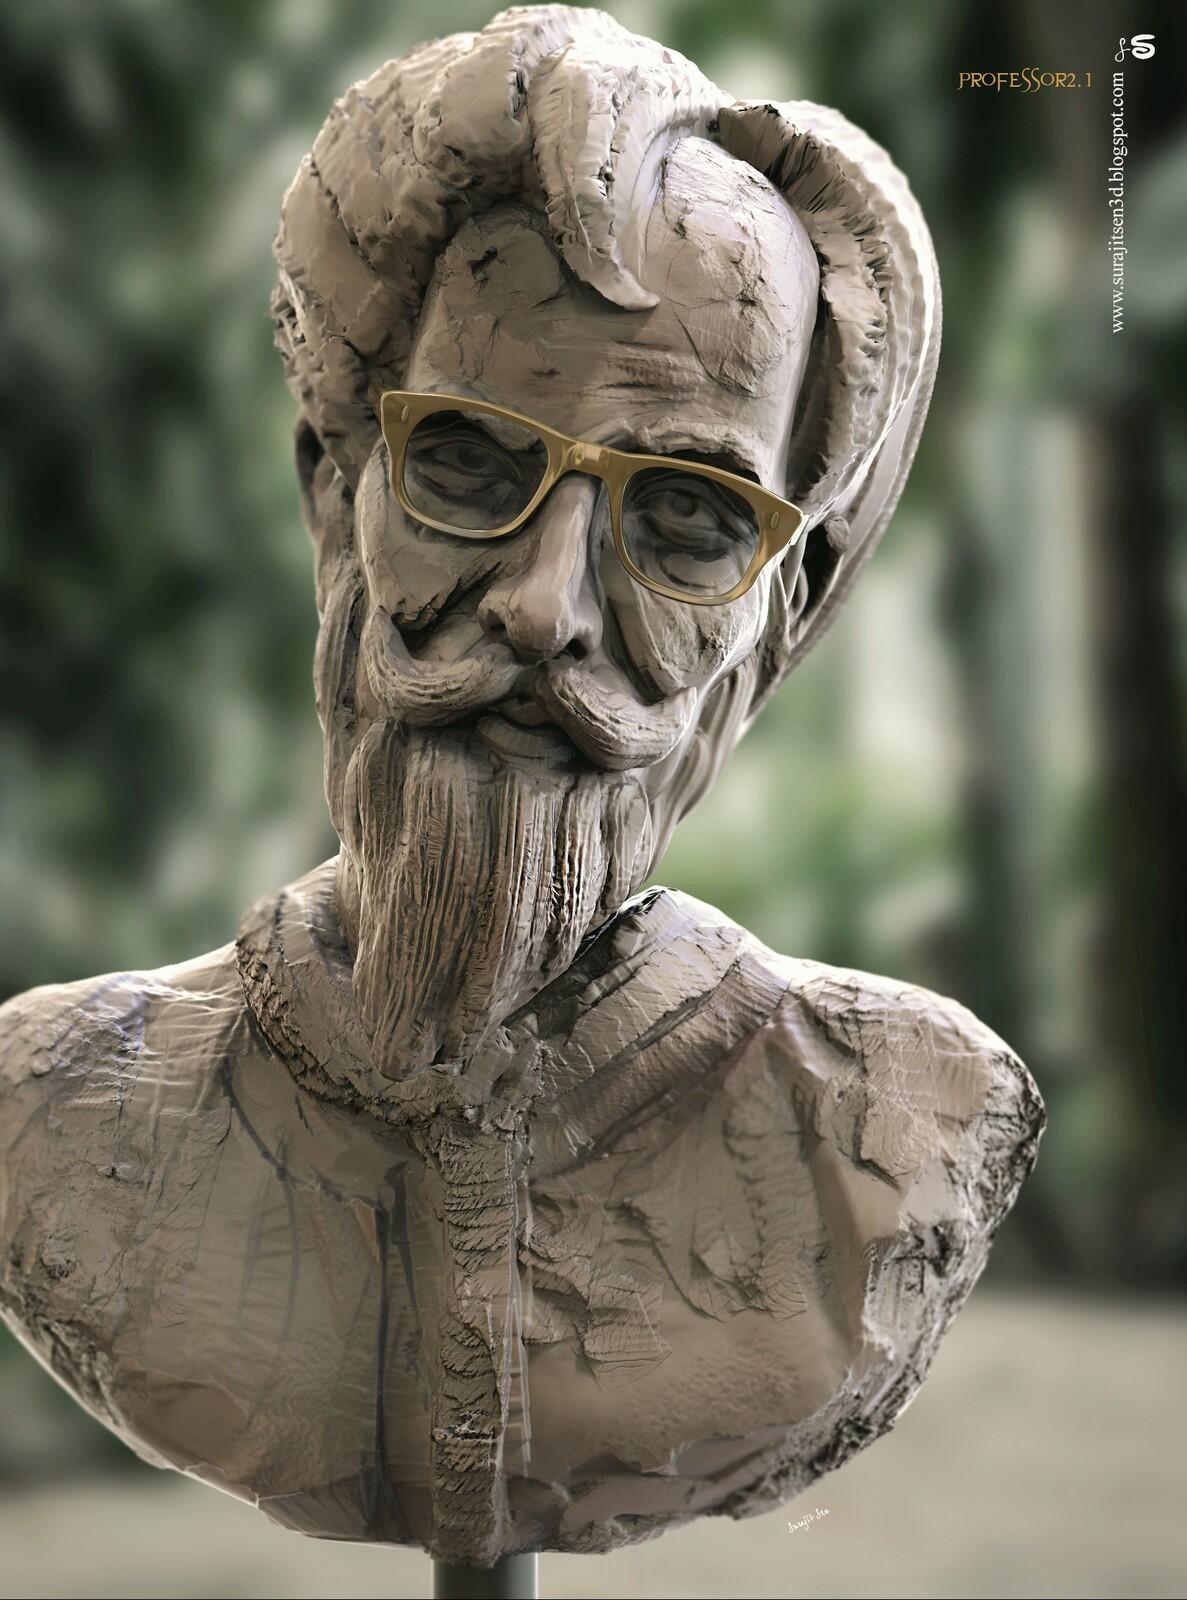 My free time speed Digital Sculpting ... Quick blocking. Professor 2.1 Background music- #hanszimmermusic